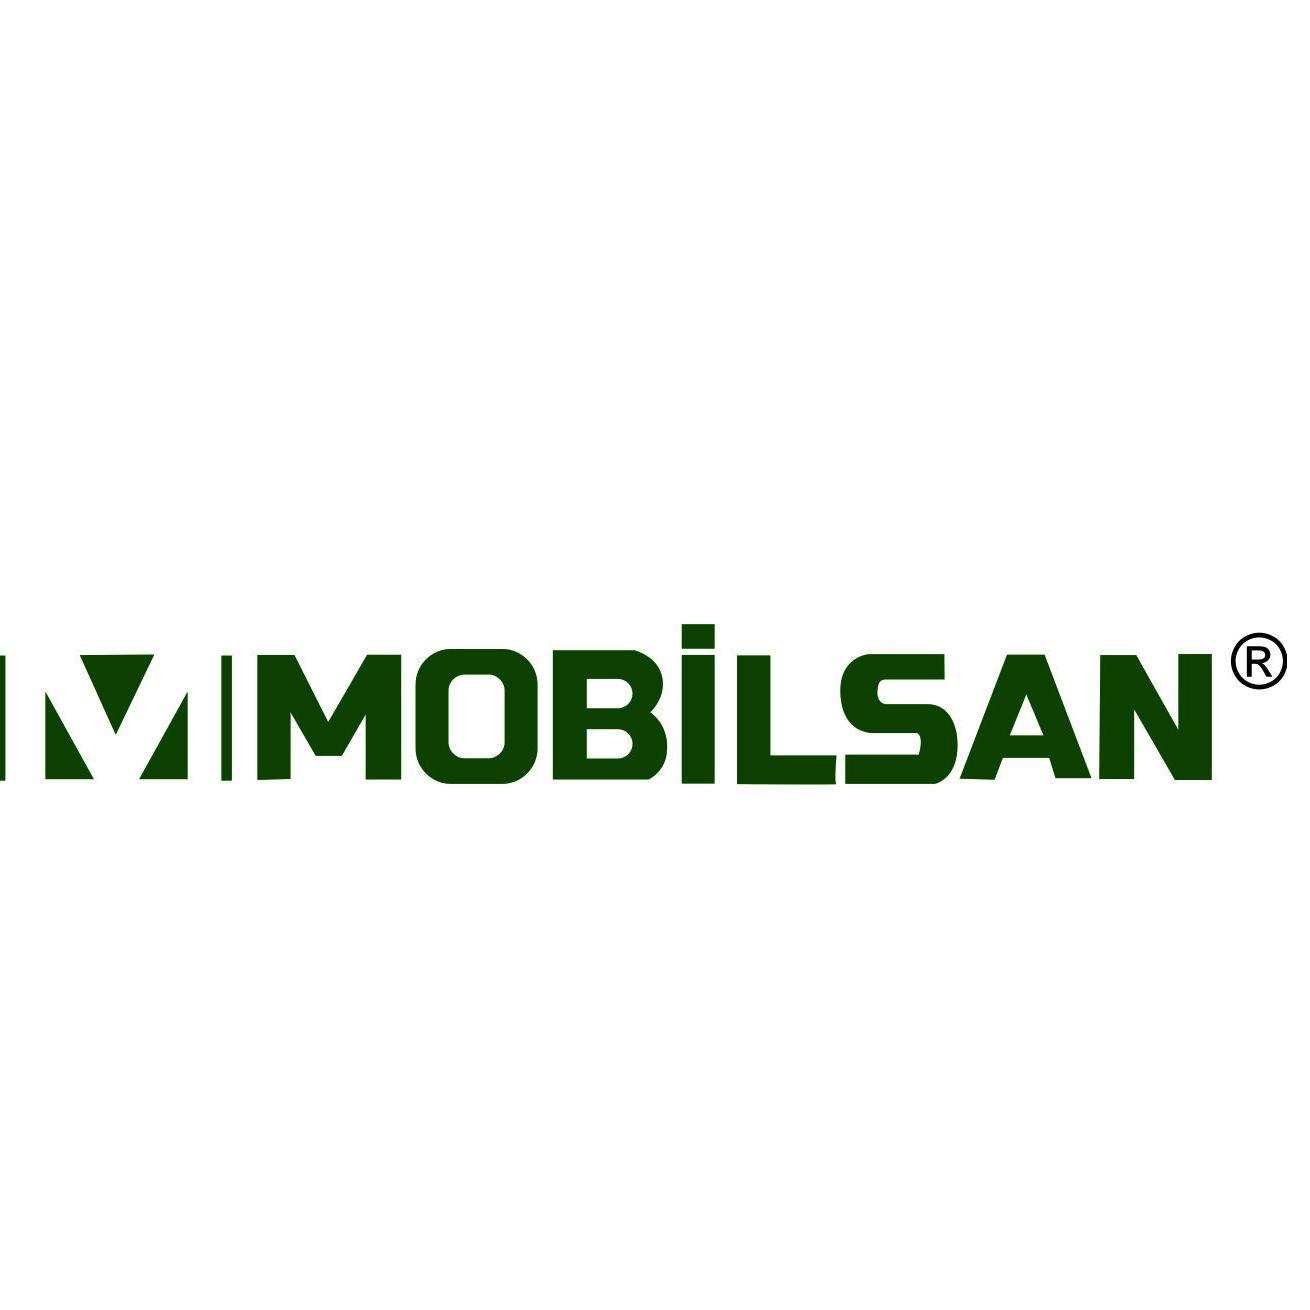 Mobilsan Mobilya İnşaat Gıda ve Nak. San. Tic. Ltd. Şti.